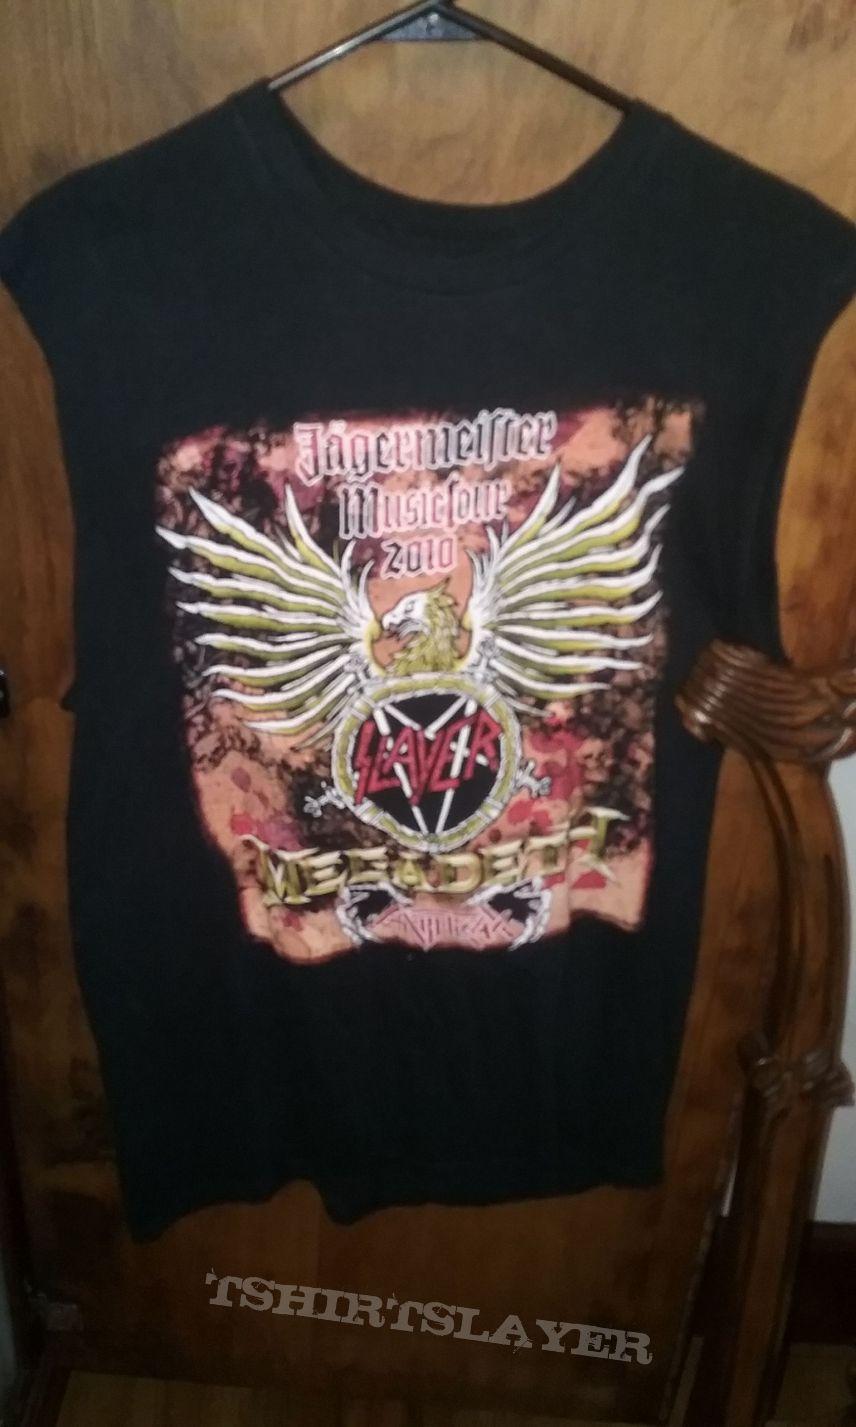 Jagermeister Music Tour 2010 Slayer & Megadeth